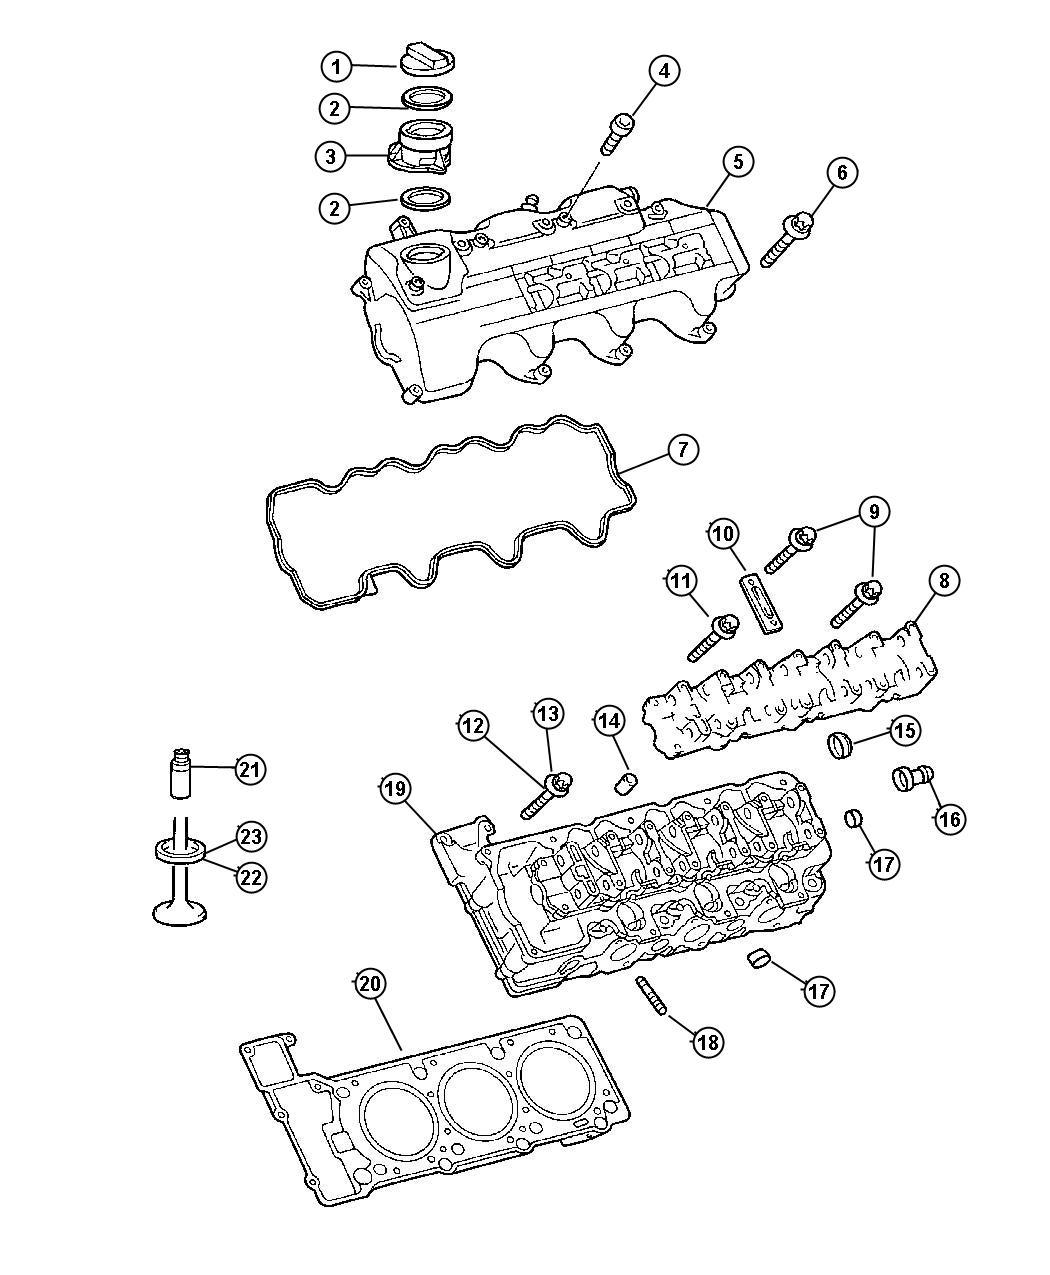 2006 Chrysler Crossfire Seat. Exhaust valve. Standard